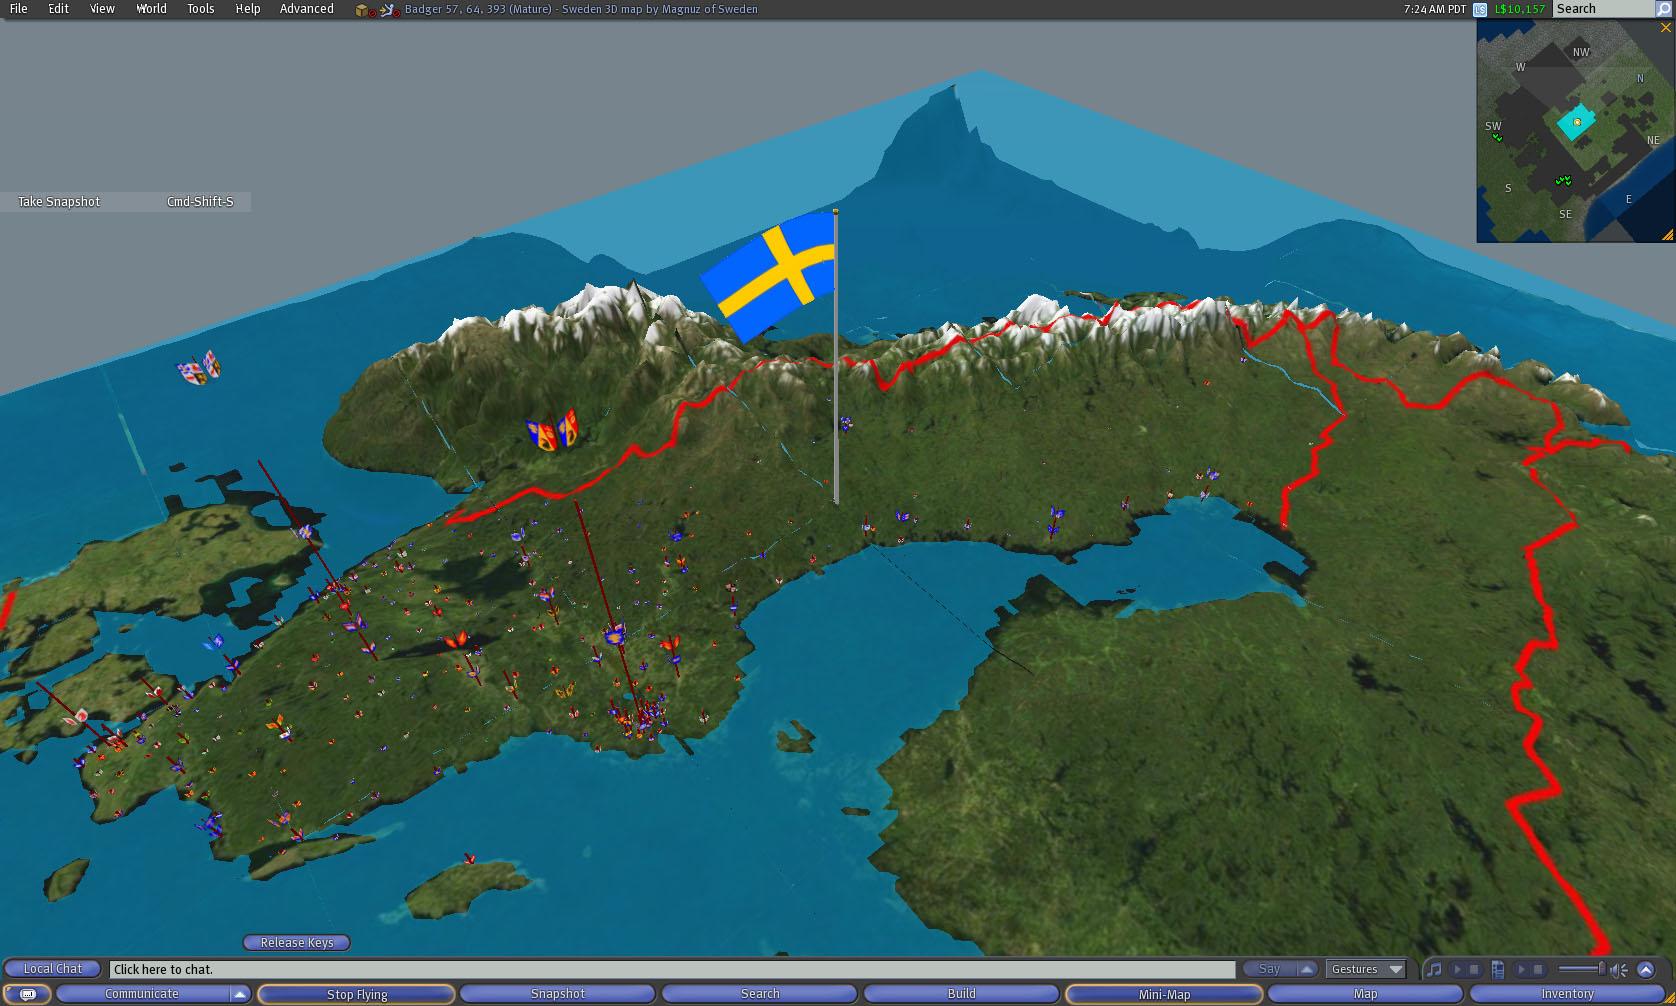 Magnuz Of Sweden Second Life Snapshots - Sweden map 3d